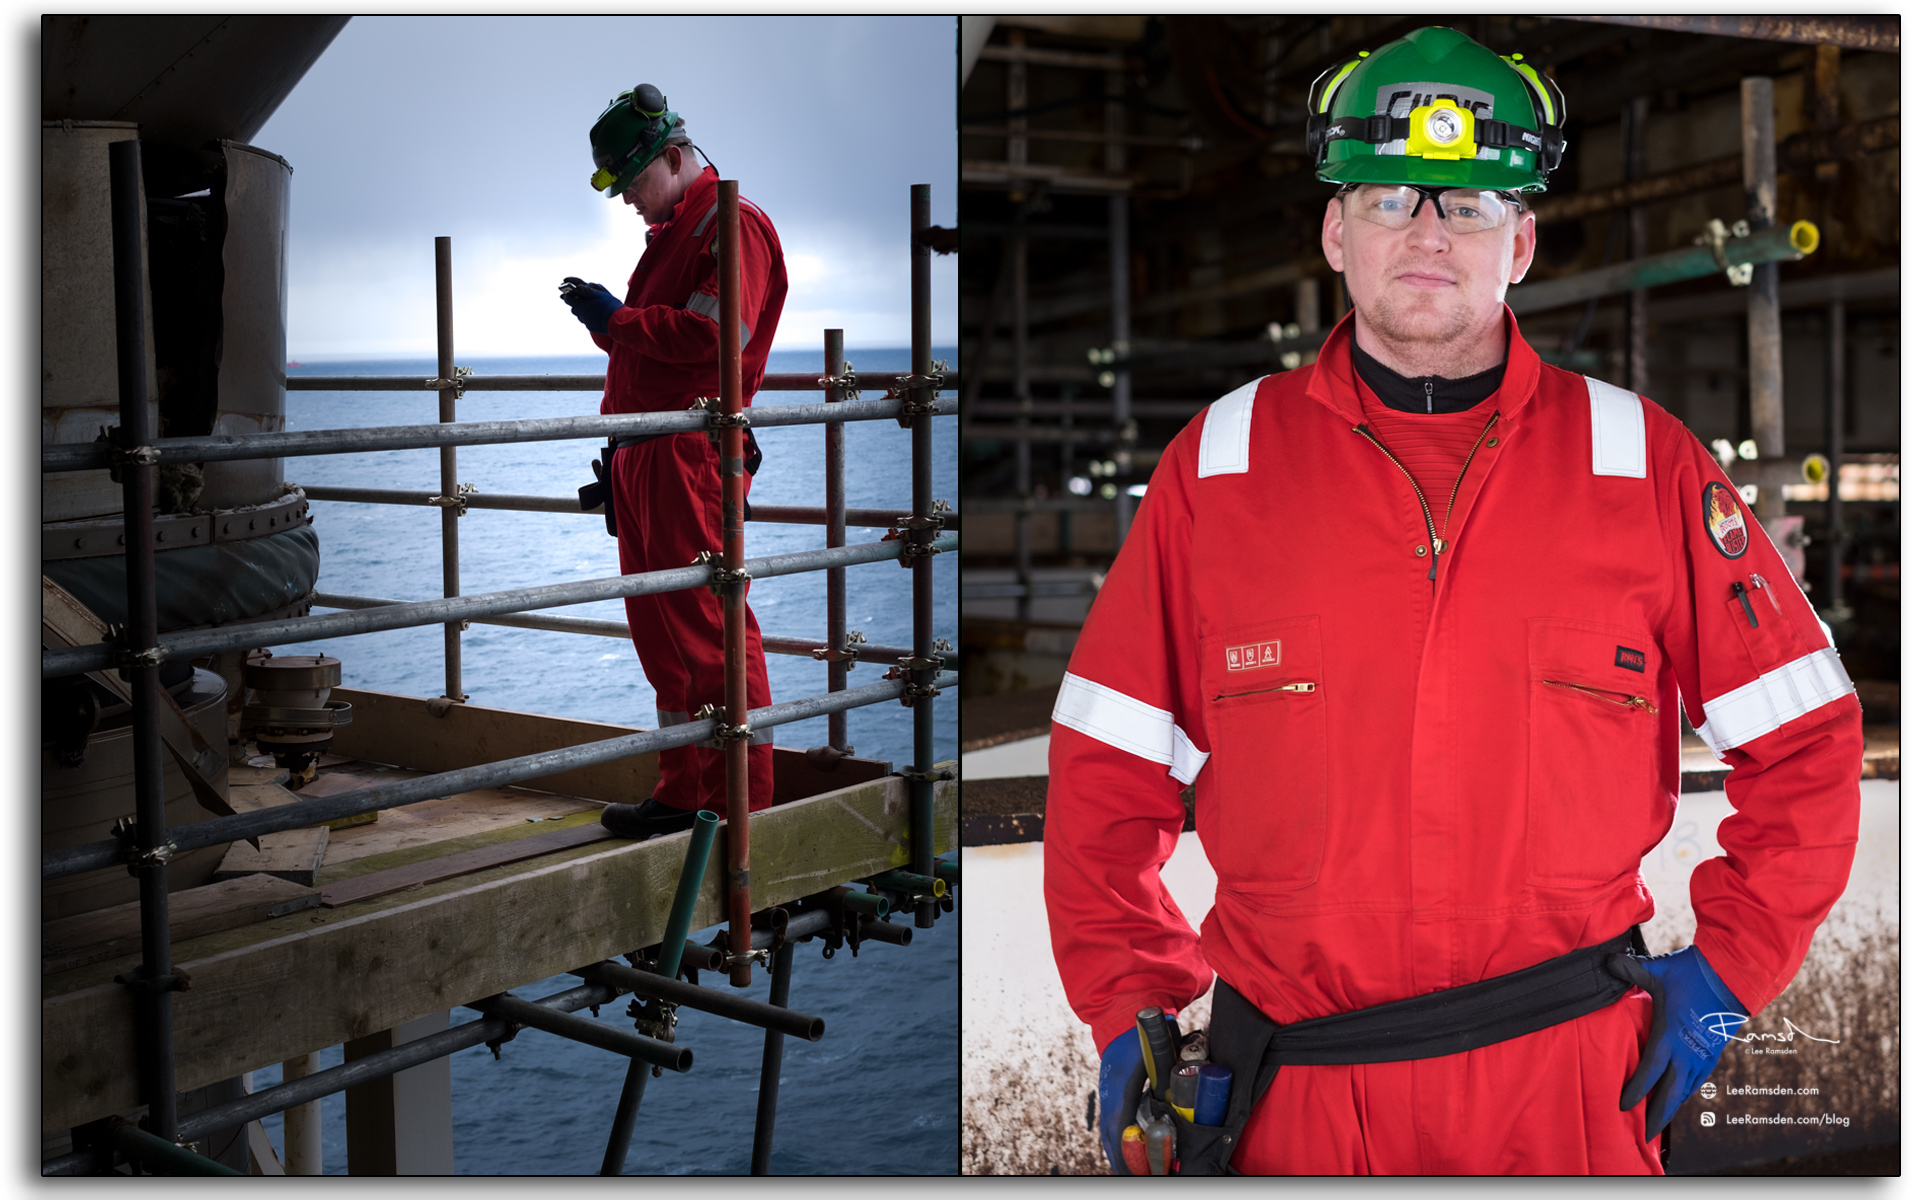 chris boyle, asbestos specialists, environmental essentials, offshore survey, removal